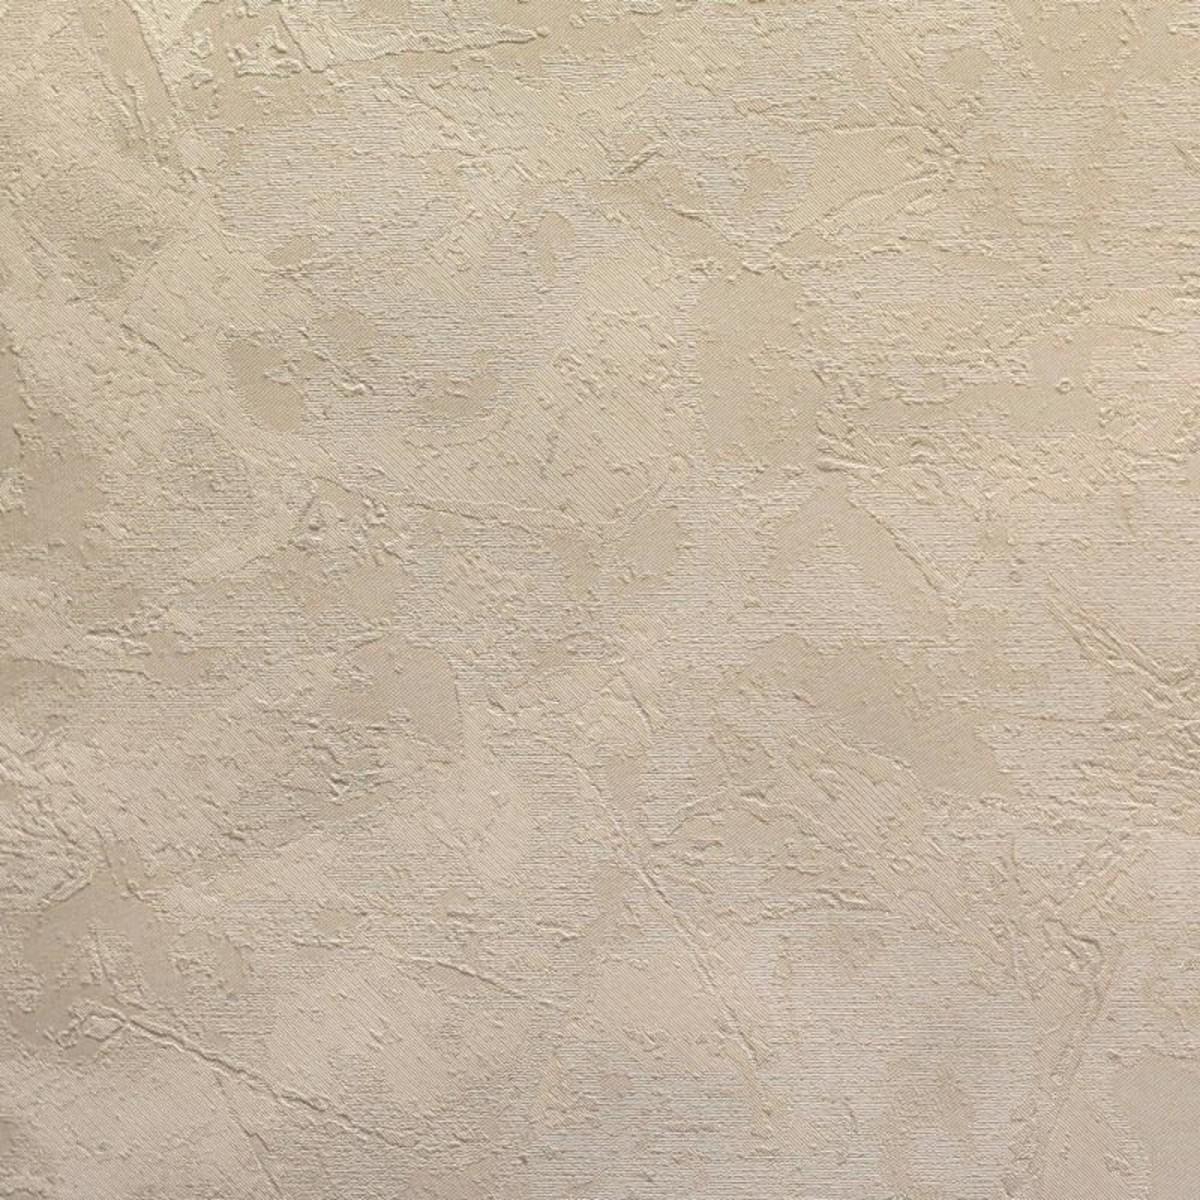 Обои виниловые Elysium Ариозо бежевые 0.53 м 59303